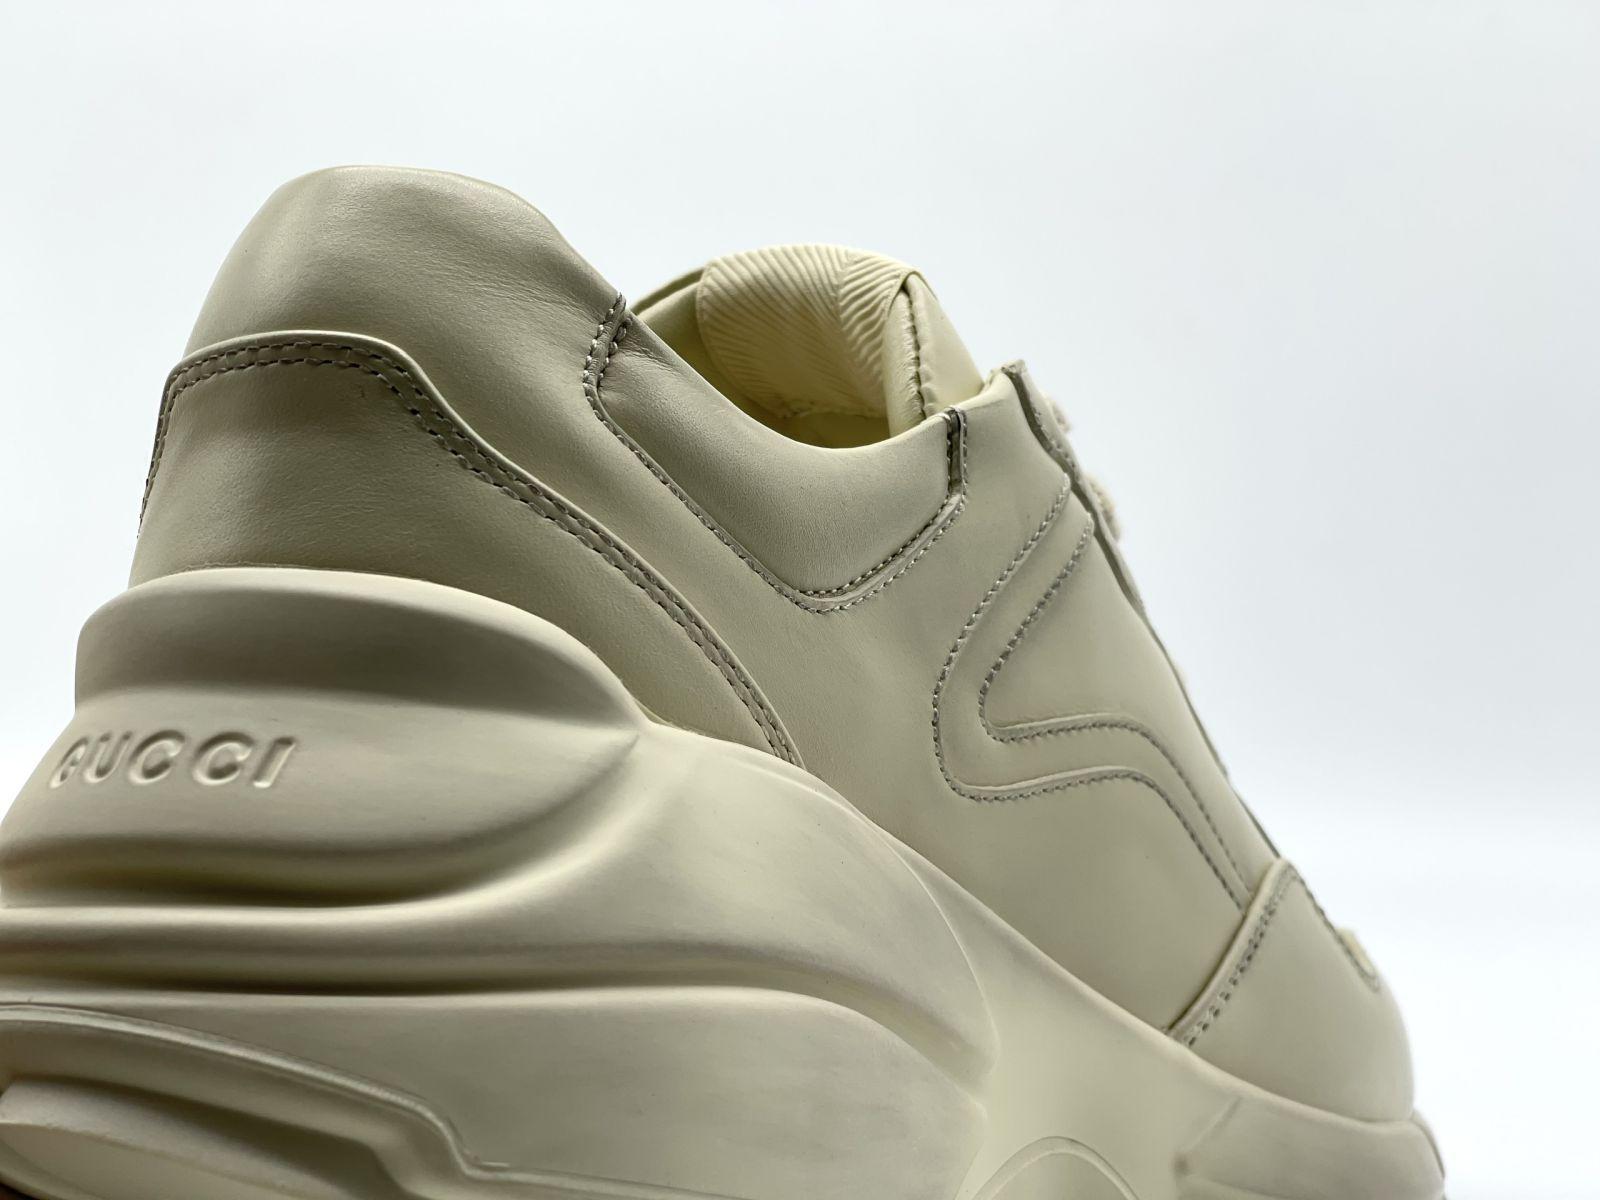 Giày Gucci Rhyton Leather da trơn bản bẩn